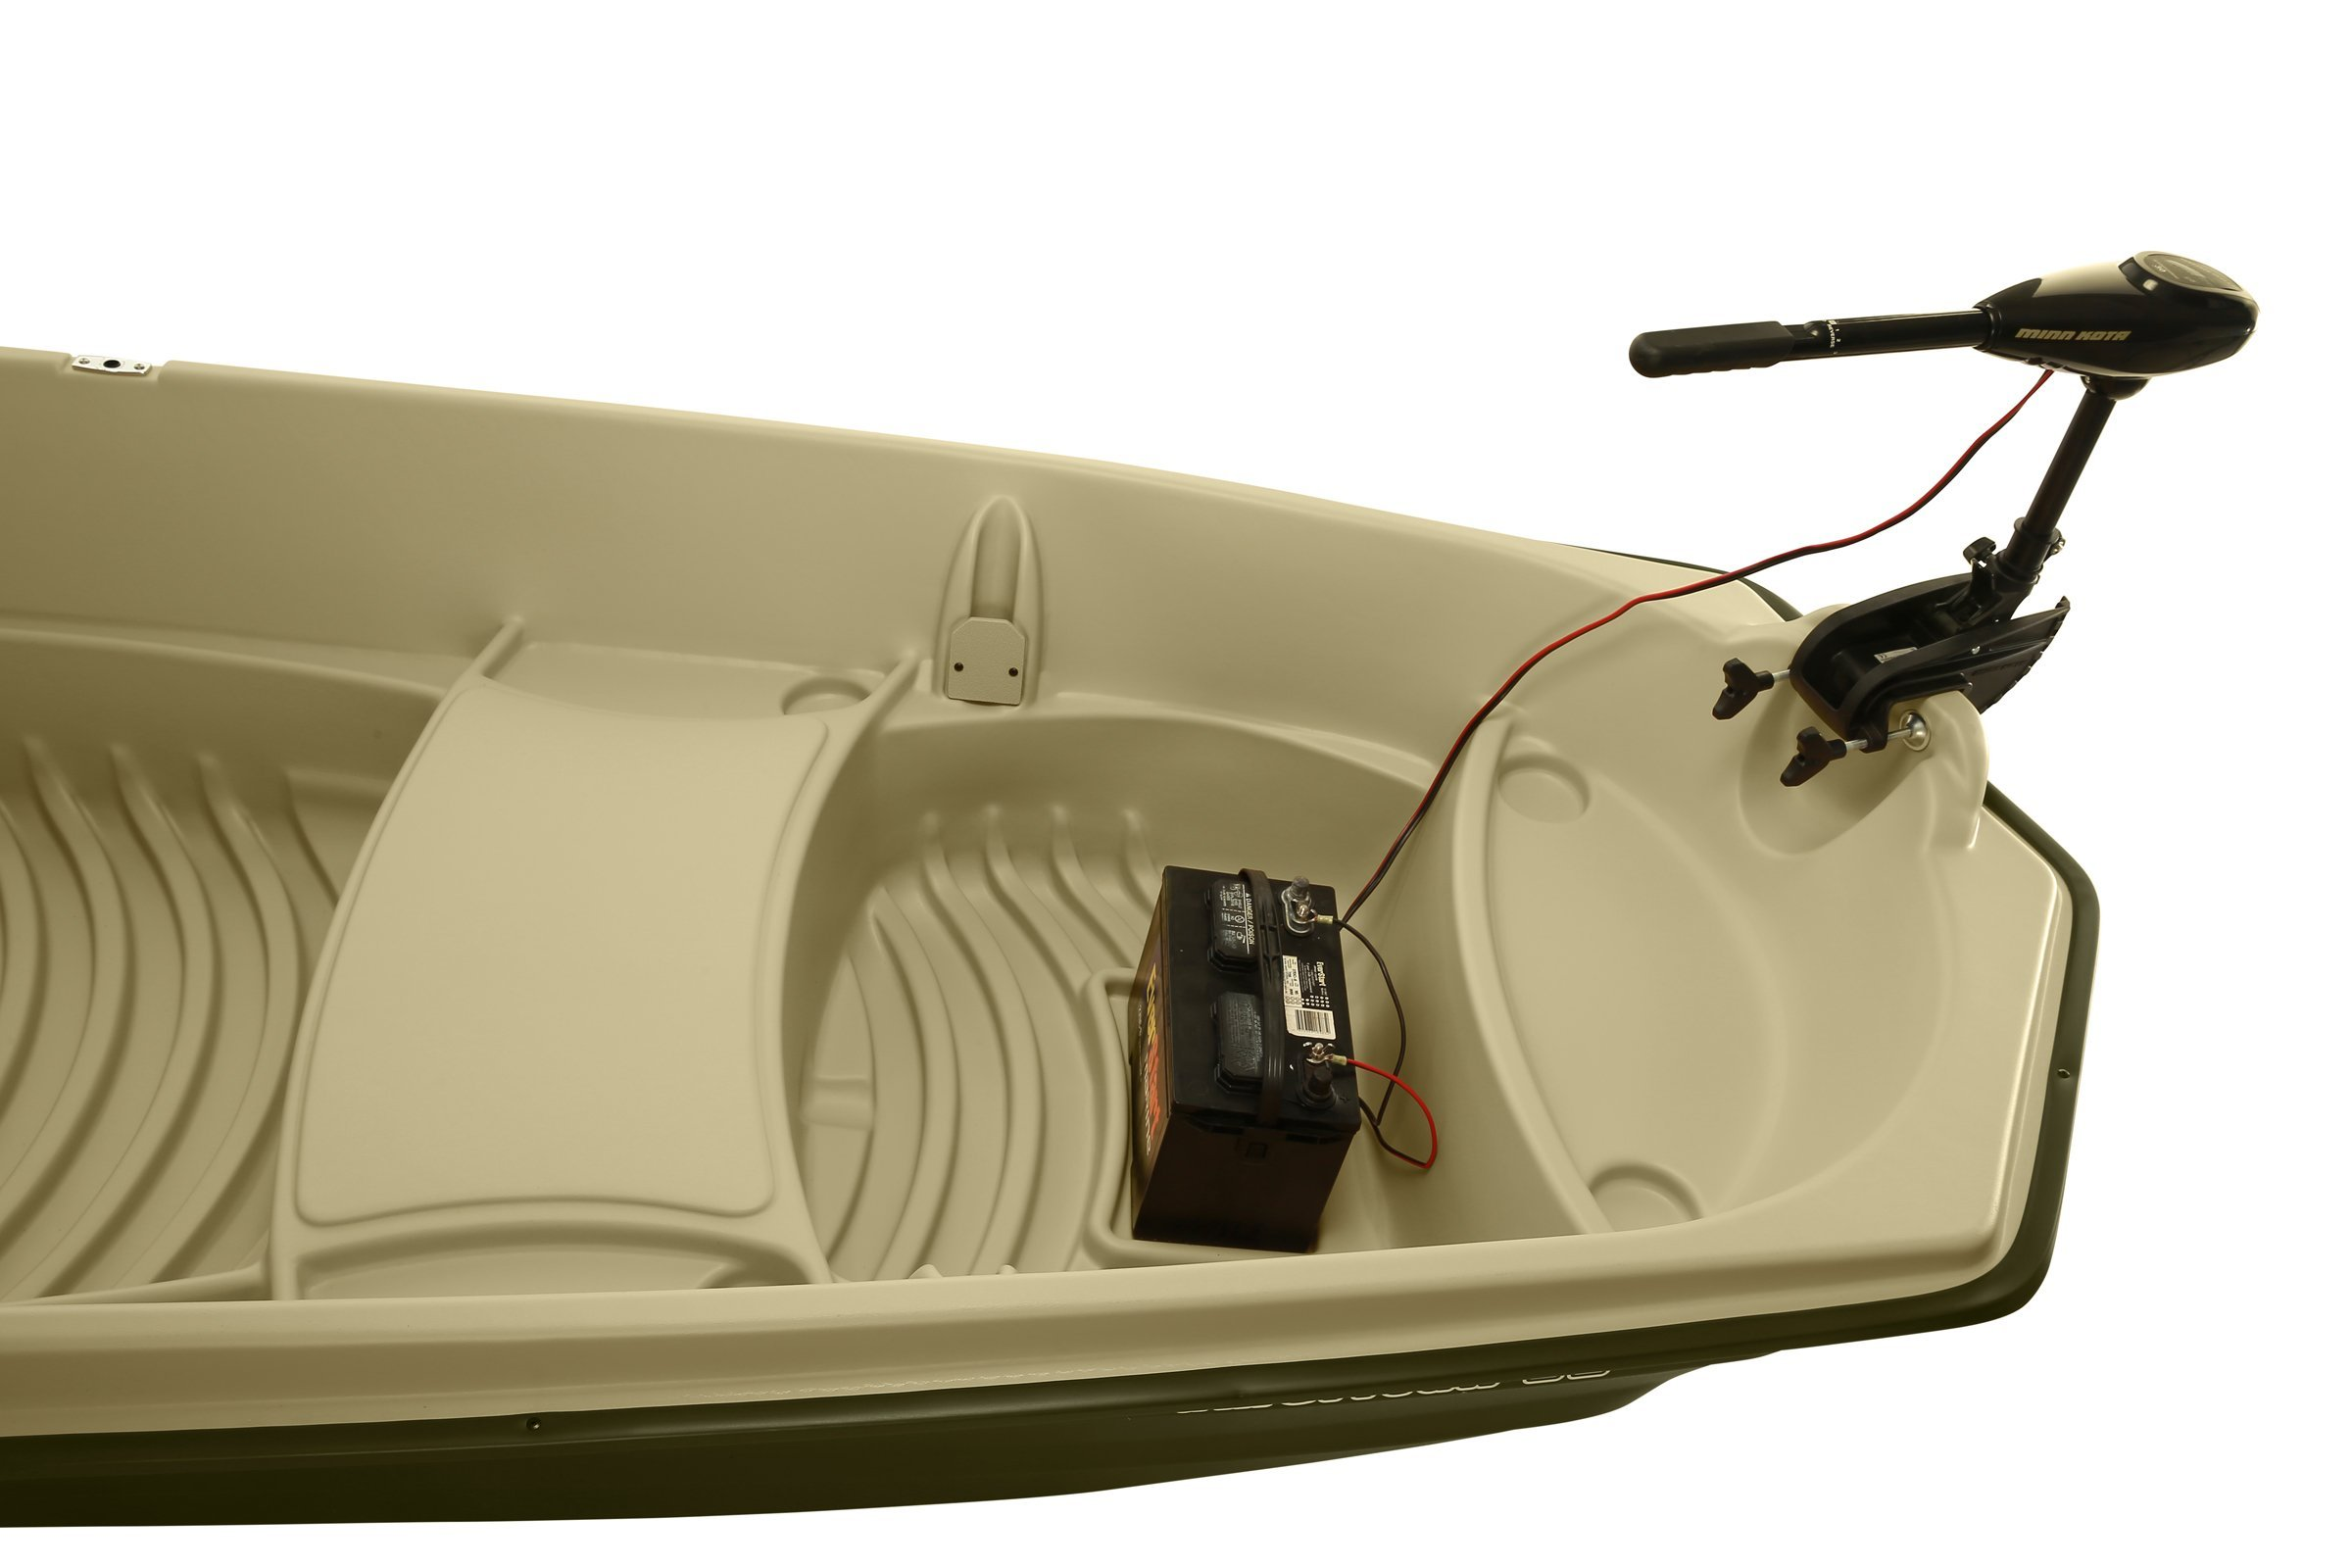 Sun Dolphin American 12 Jon Fishing Boat (Beige/Green, 12-Feet) by Sun Dolphin (Image #4)